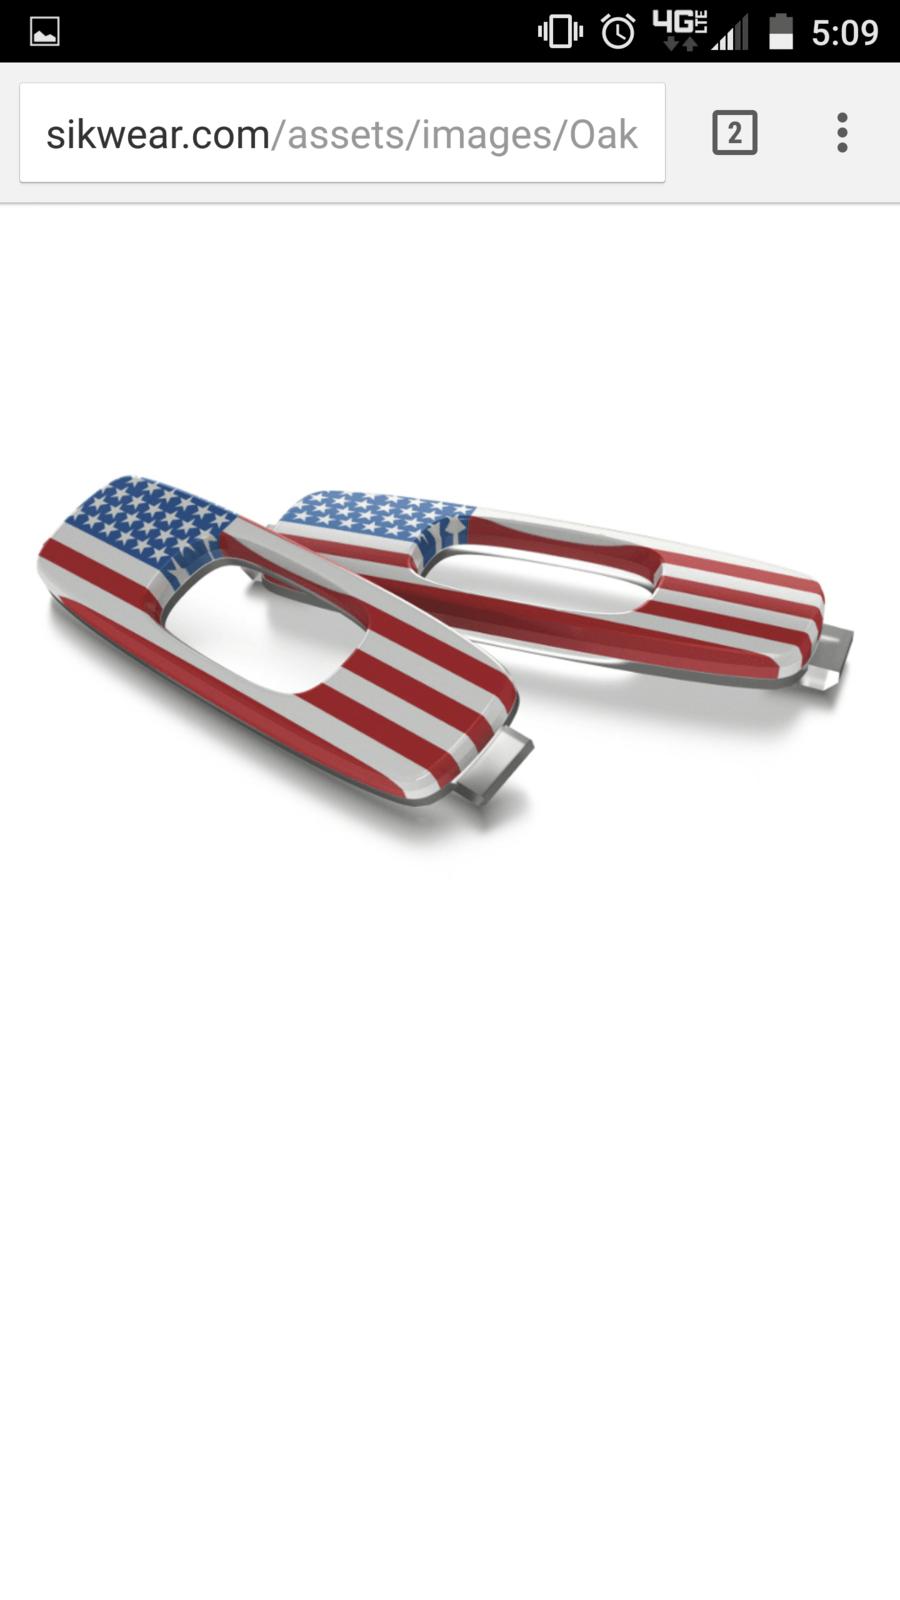 Oakley Batwolf USA Flag Icons - Screenshot_2016-09-26-17-10-01.png